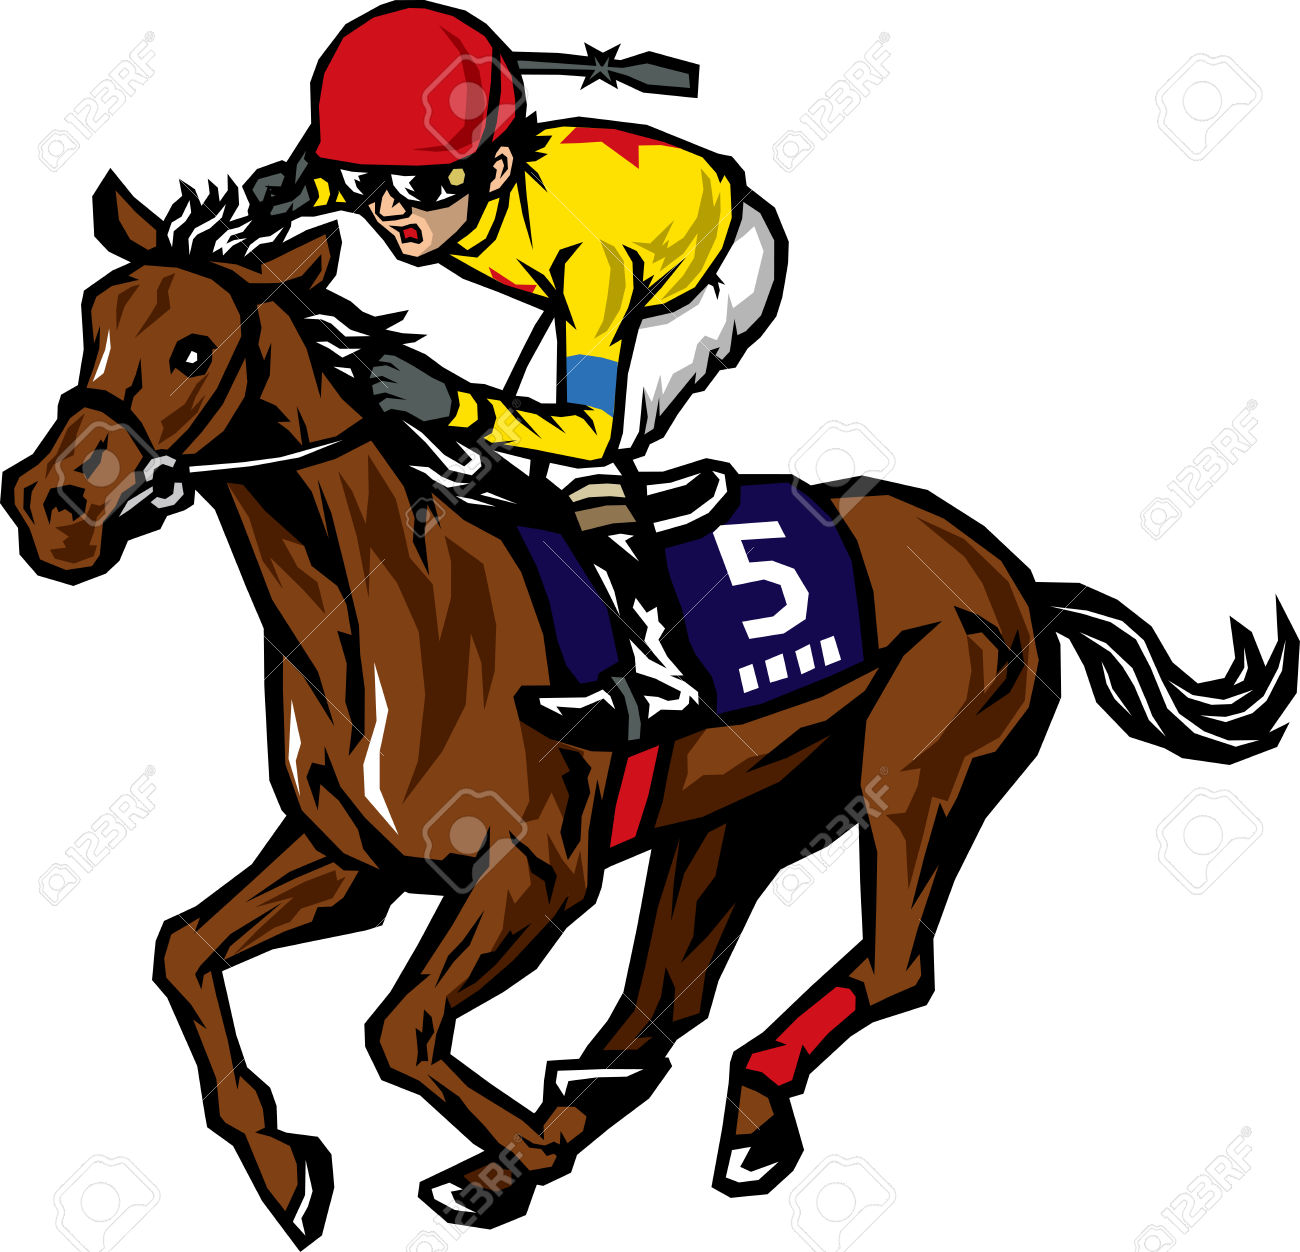 Racer clipart (1 mb) Horse Clipartner Clipart